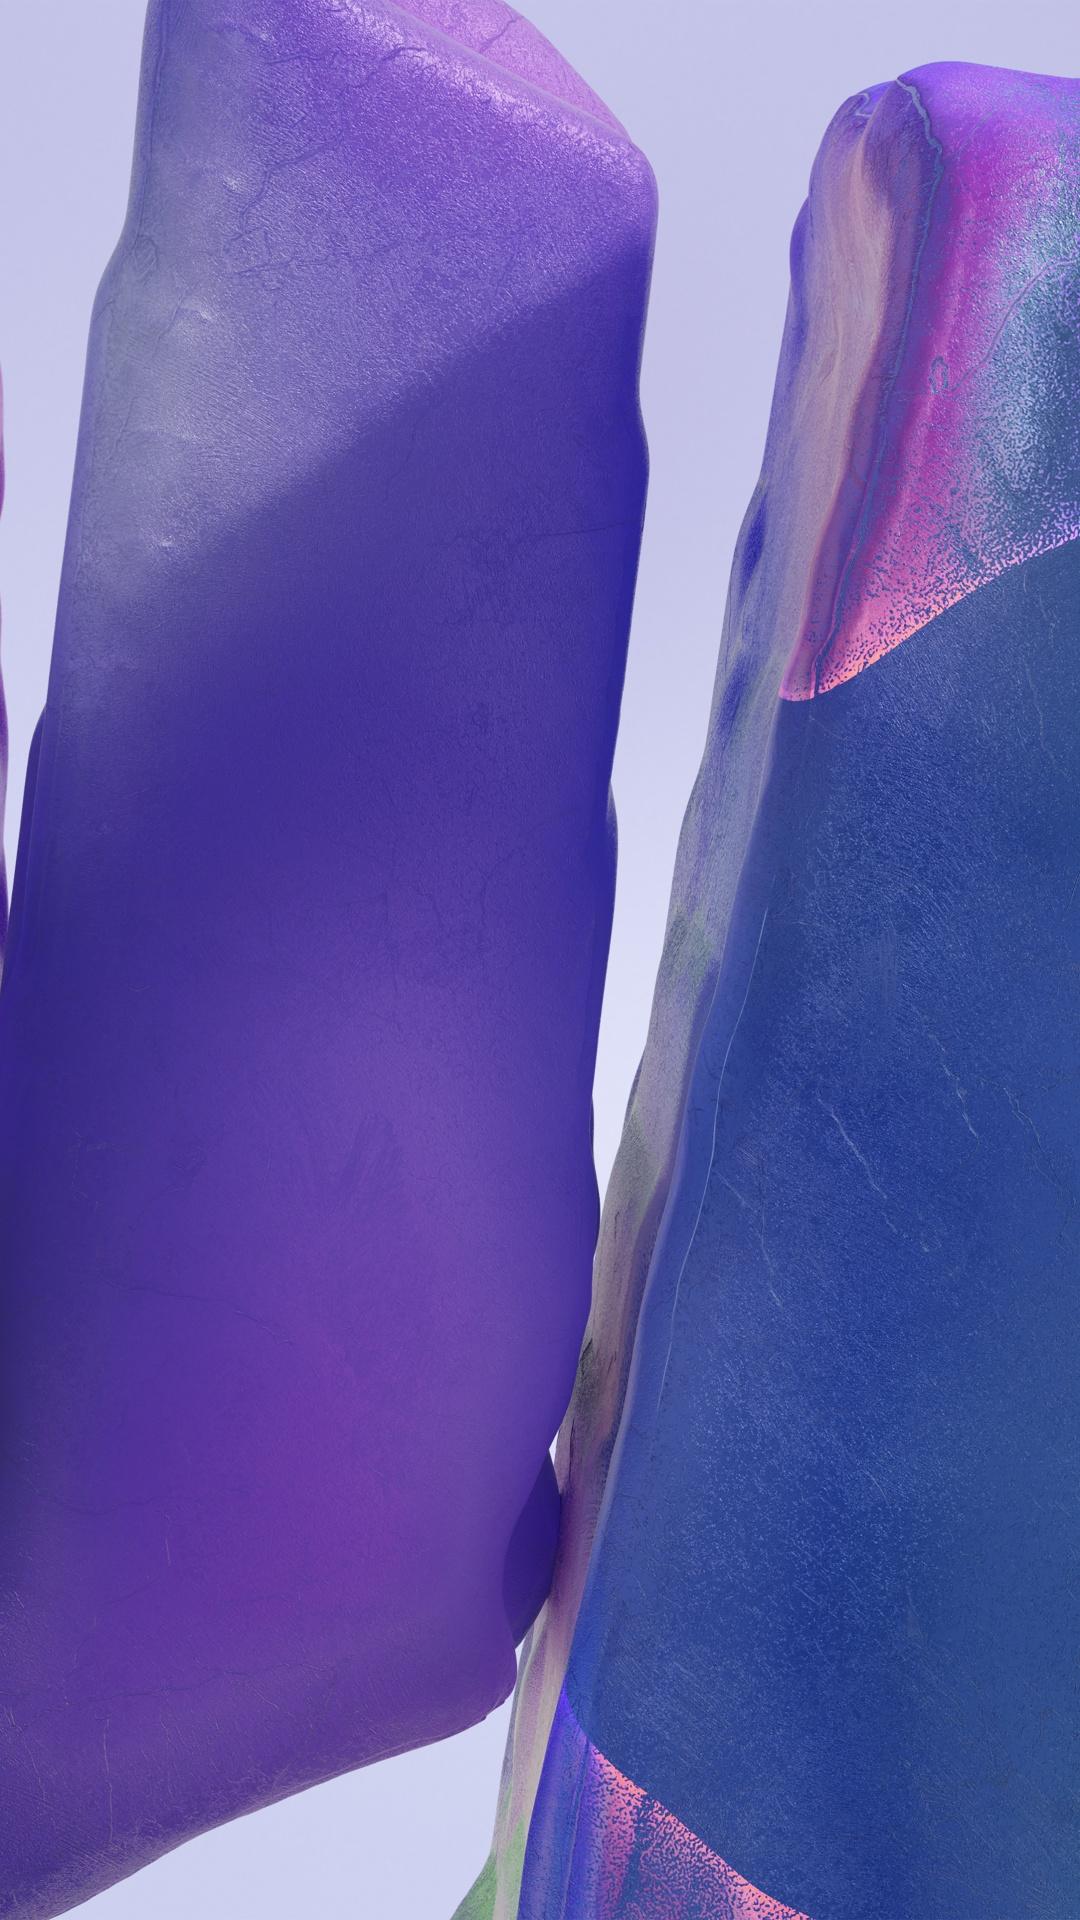 Samsung Galaxy Note 20 Ultra 4K Wallpaper, Purple, Blue